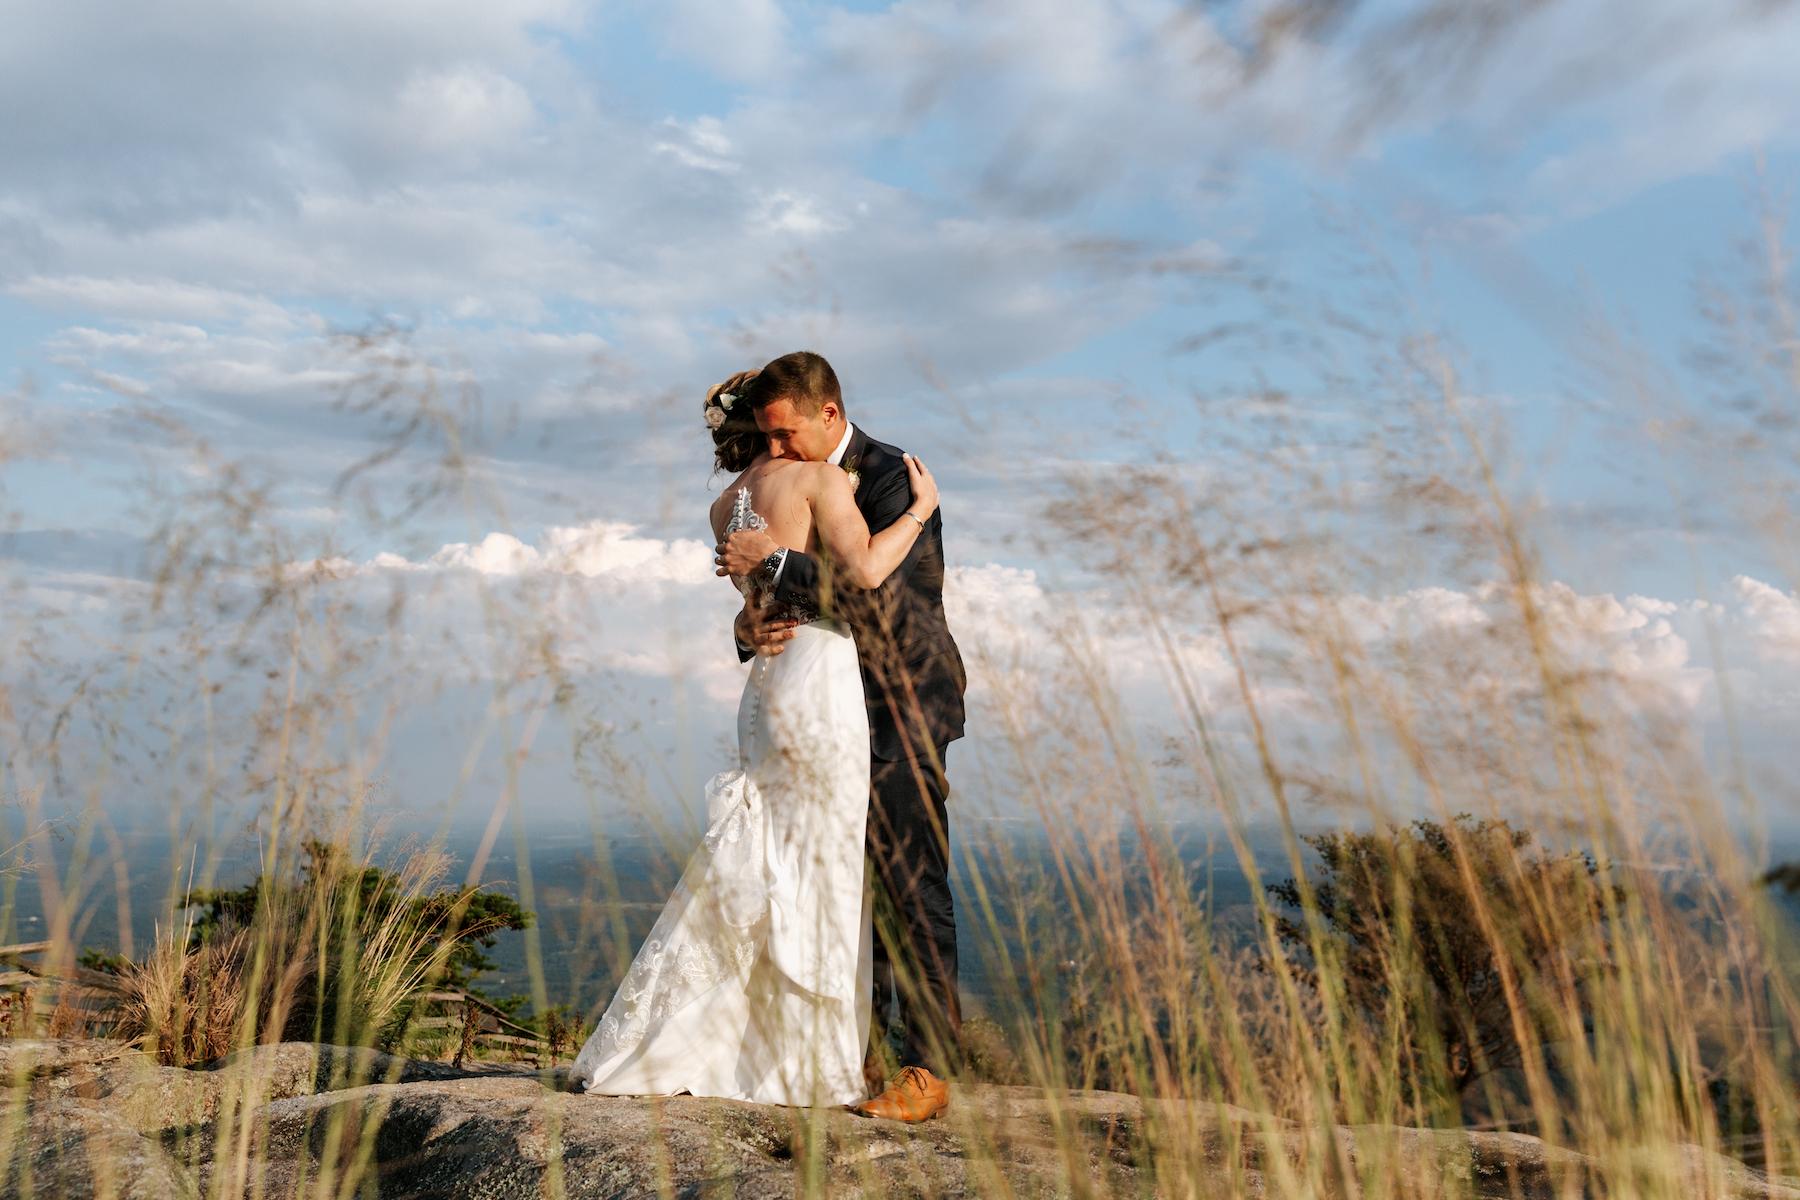 wedding-engagement-photographer-spartanburg-greenville-columbia-carolina-south-north-528.JPG